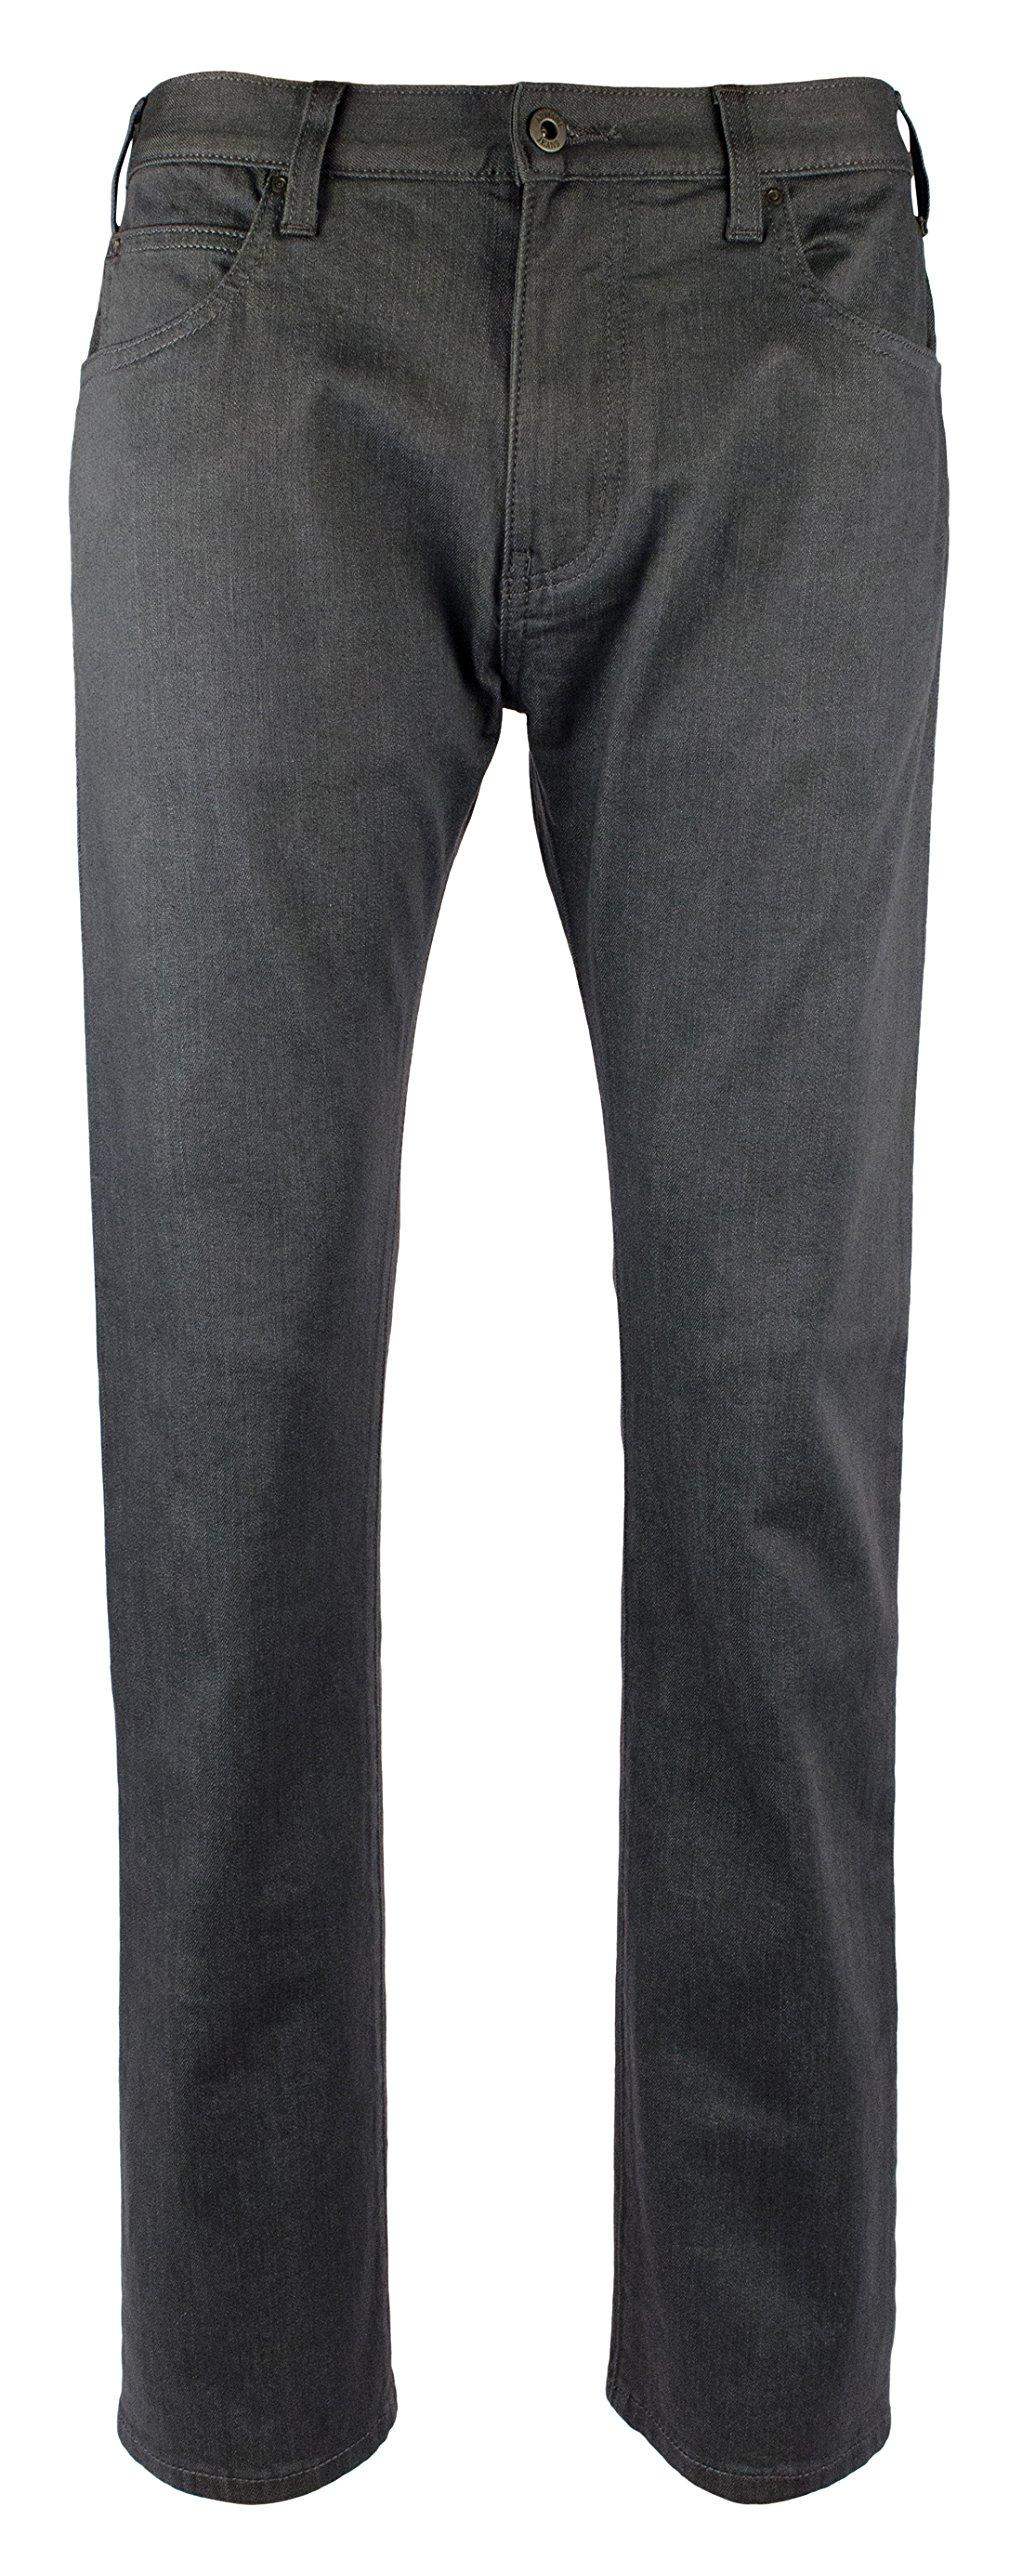 Armani Men's Stretch Slim Fit J45 Jeans Pants-G-36Wx30L